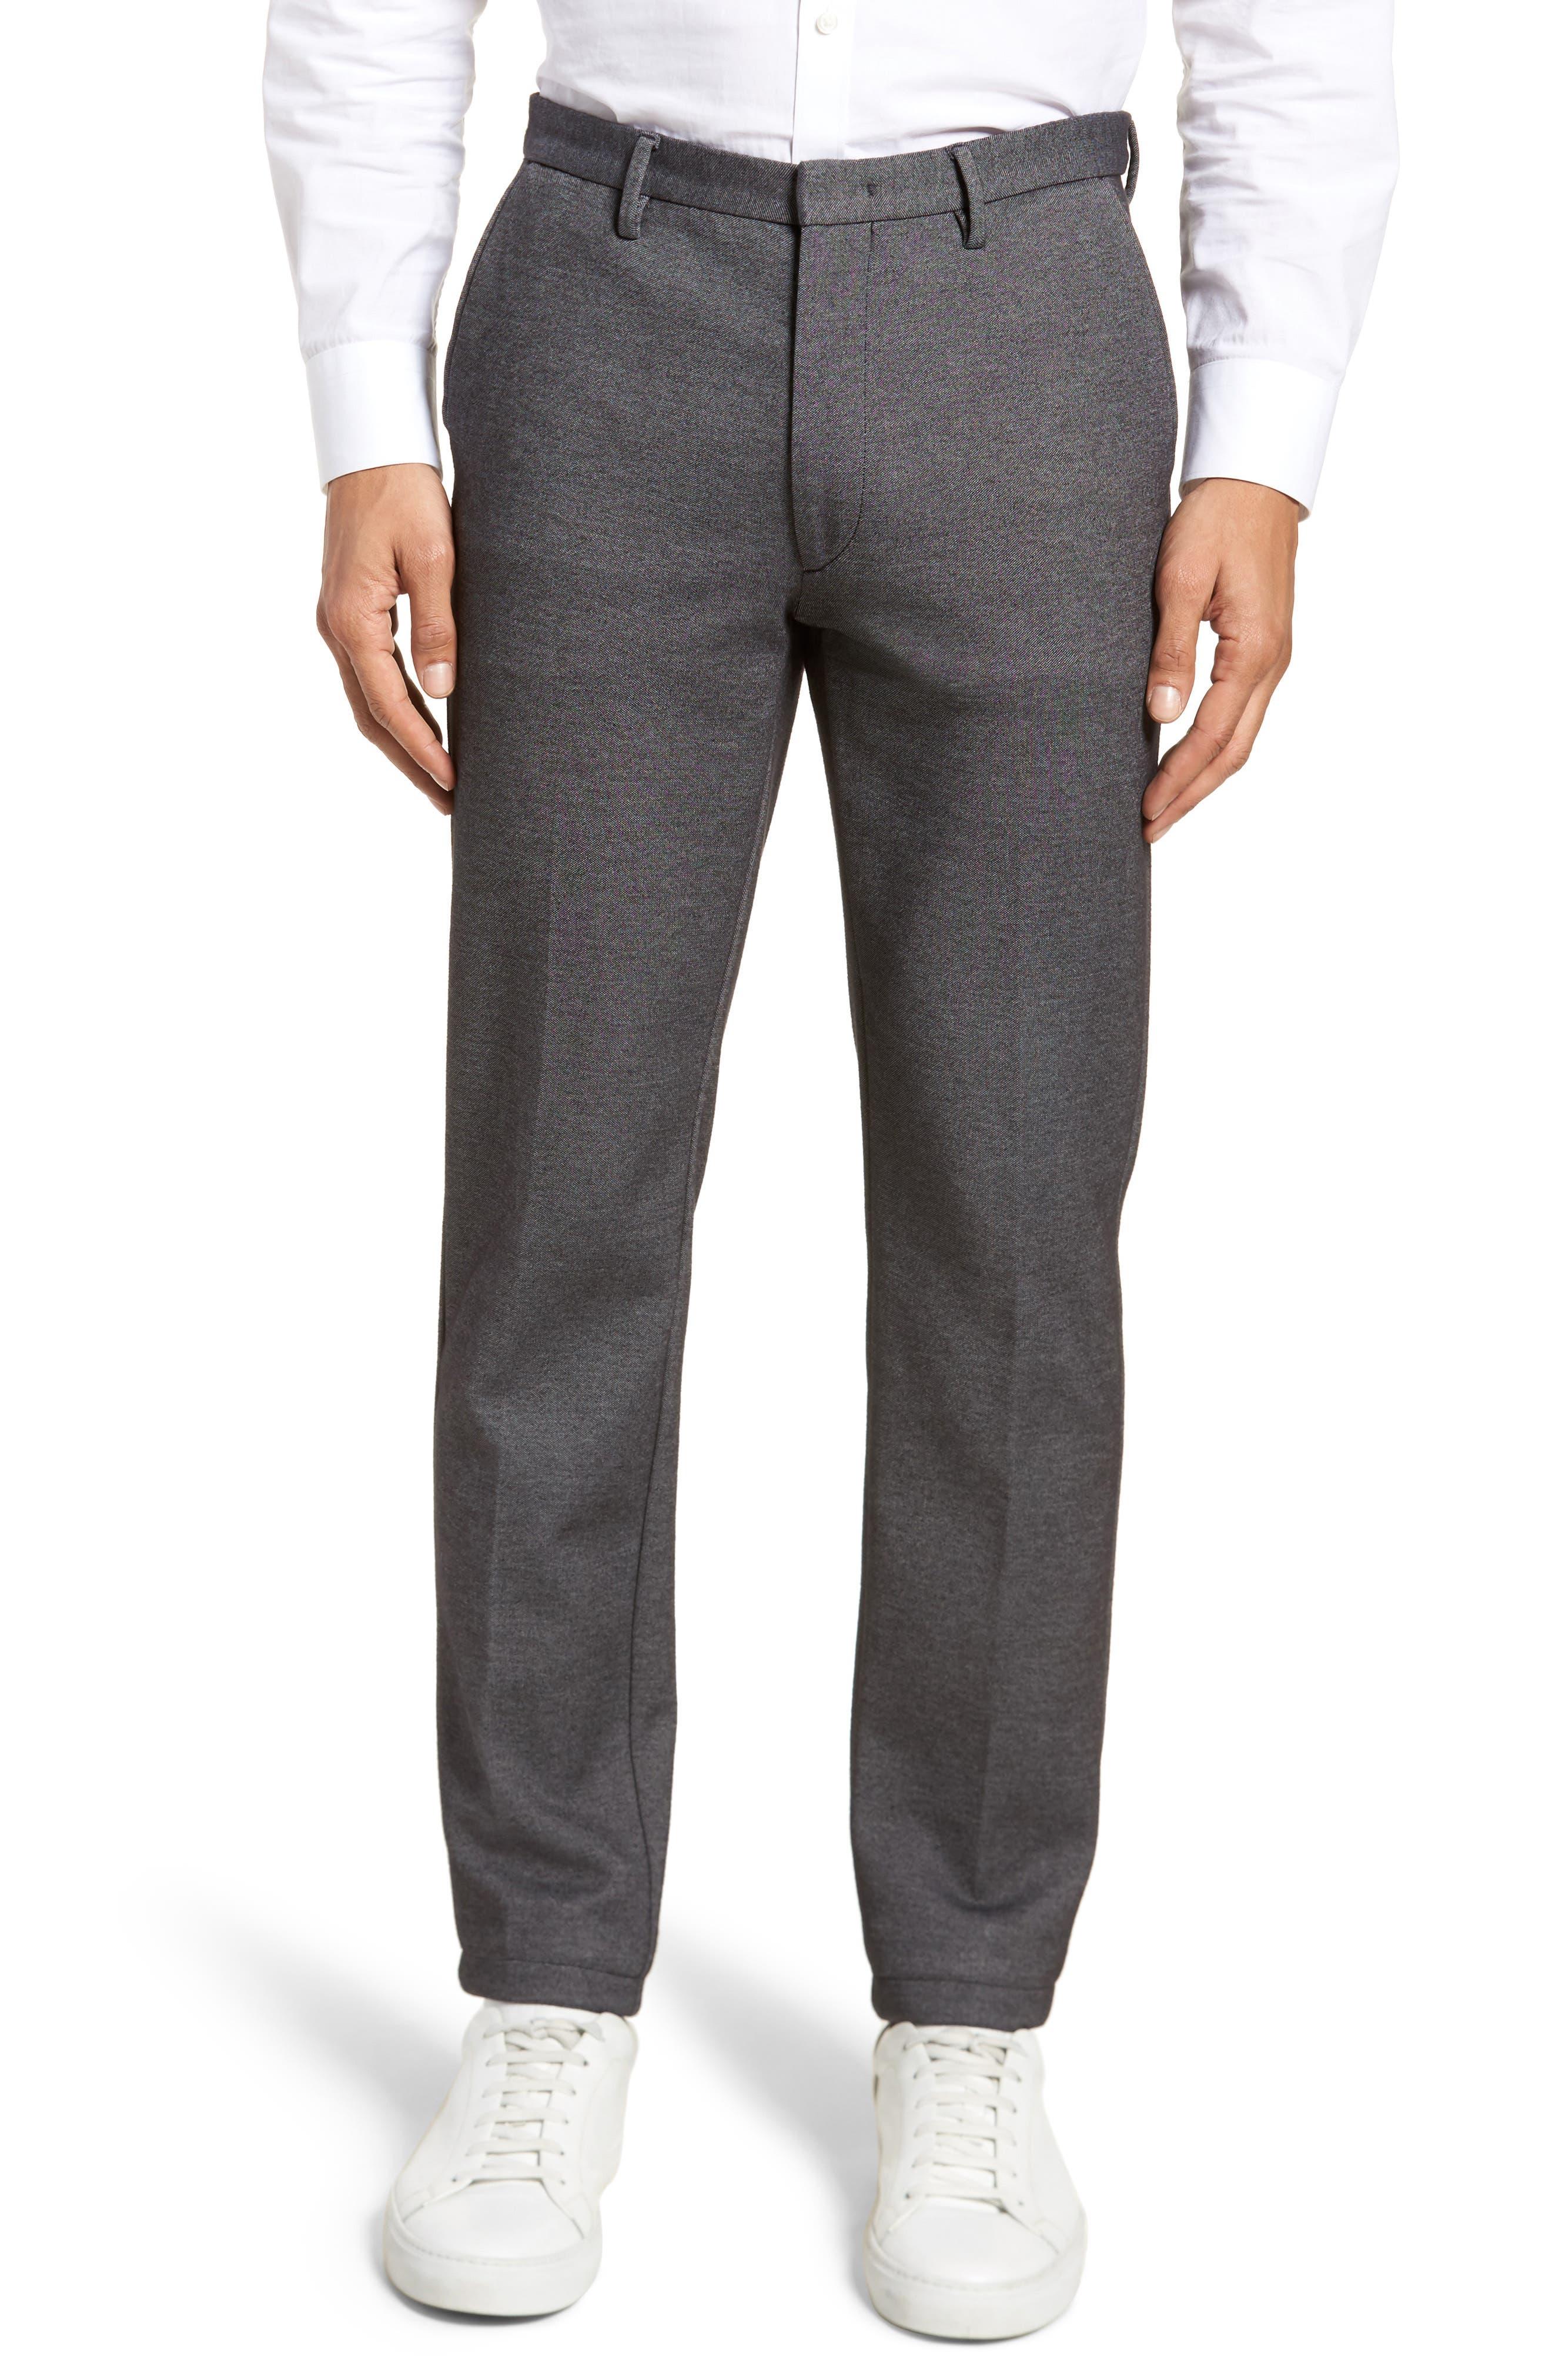 Kaito Melange Cotton Blend Pants,                             Main thumbnail 1, color,                             030